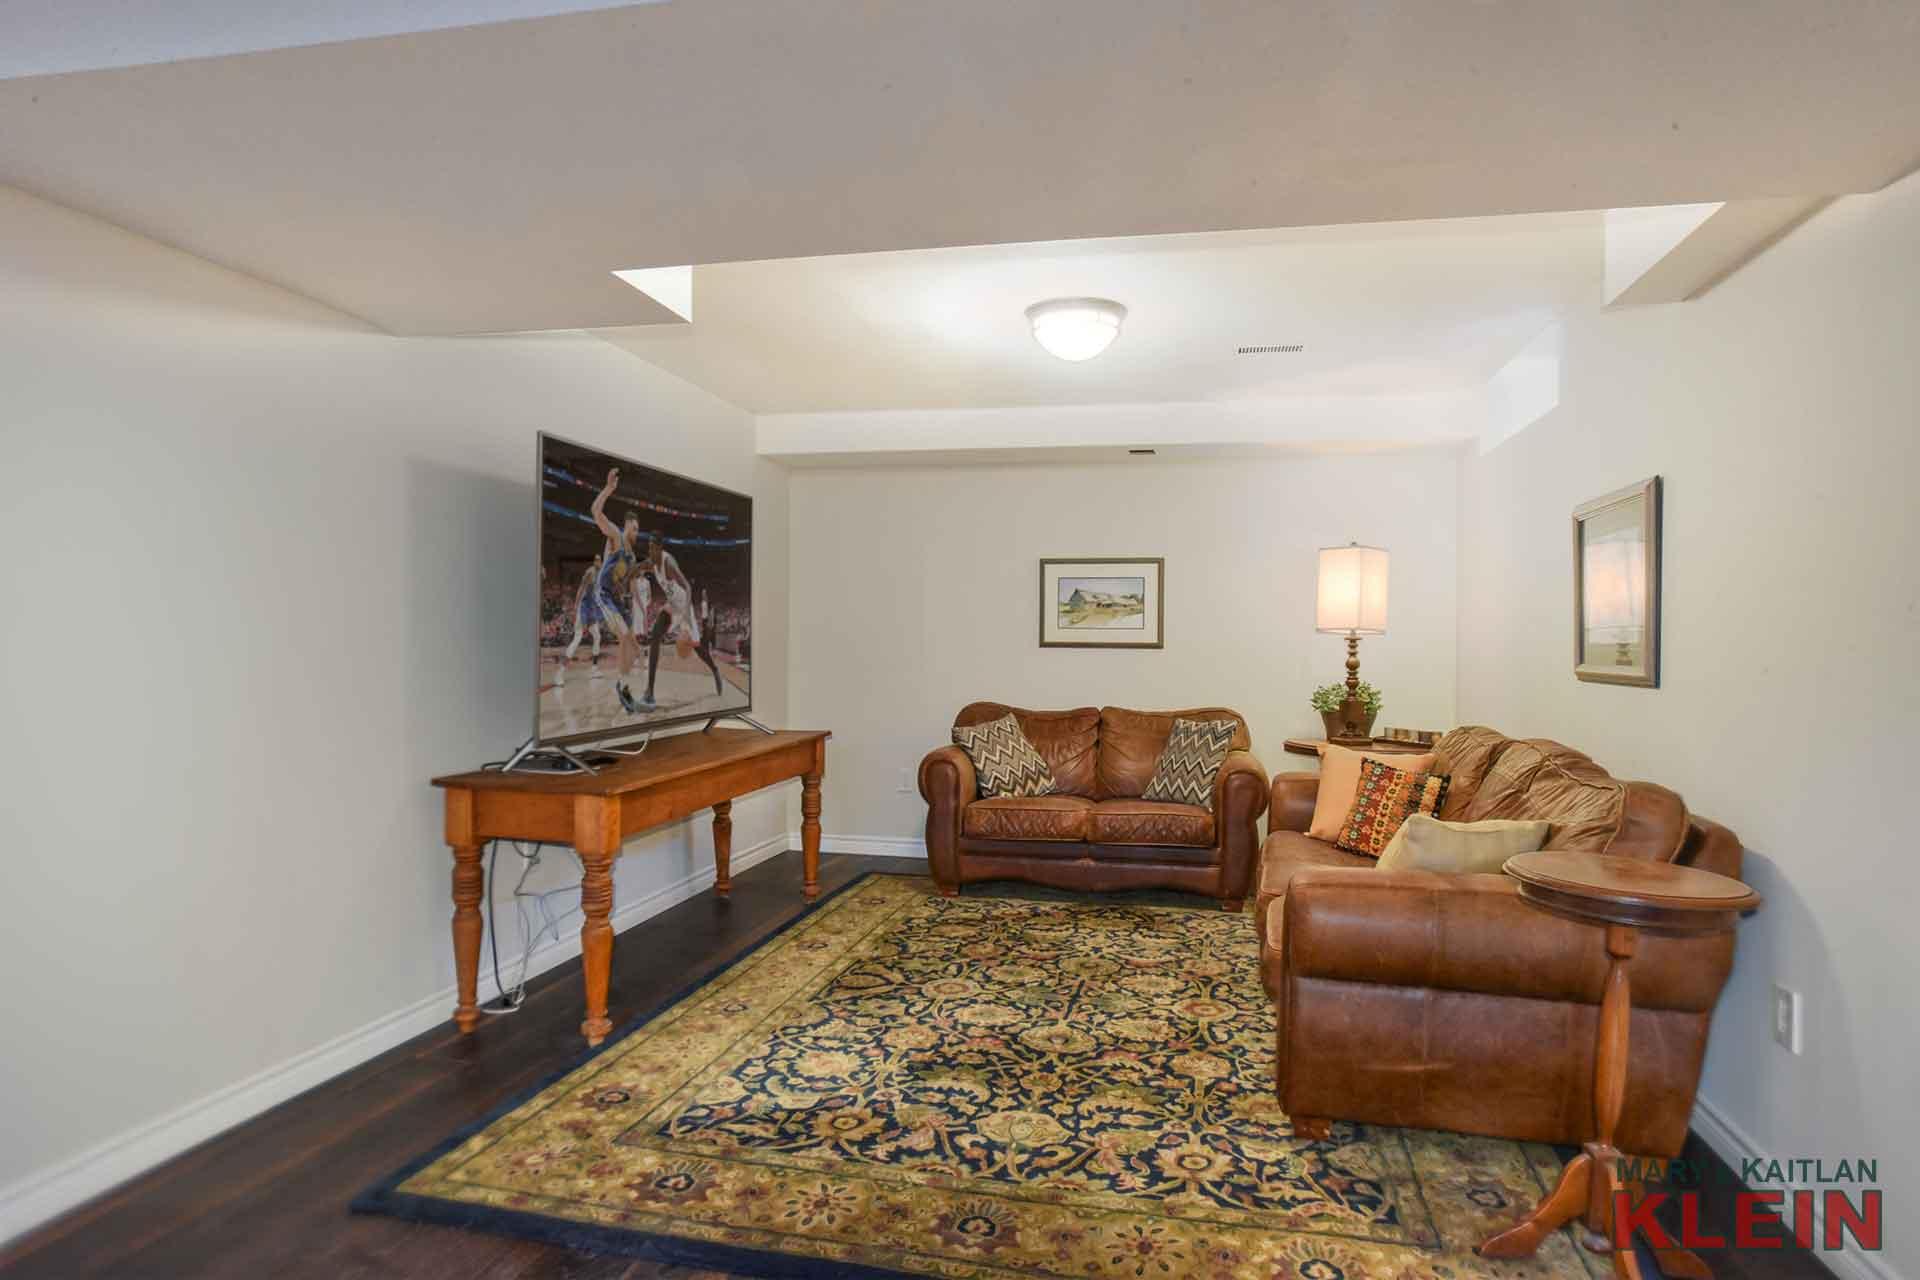 Basement Rec Area - Hardwood Flooring, Pot Lighting